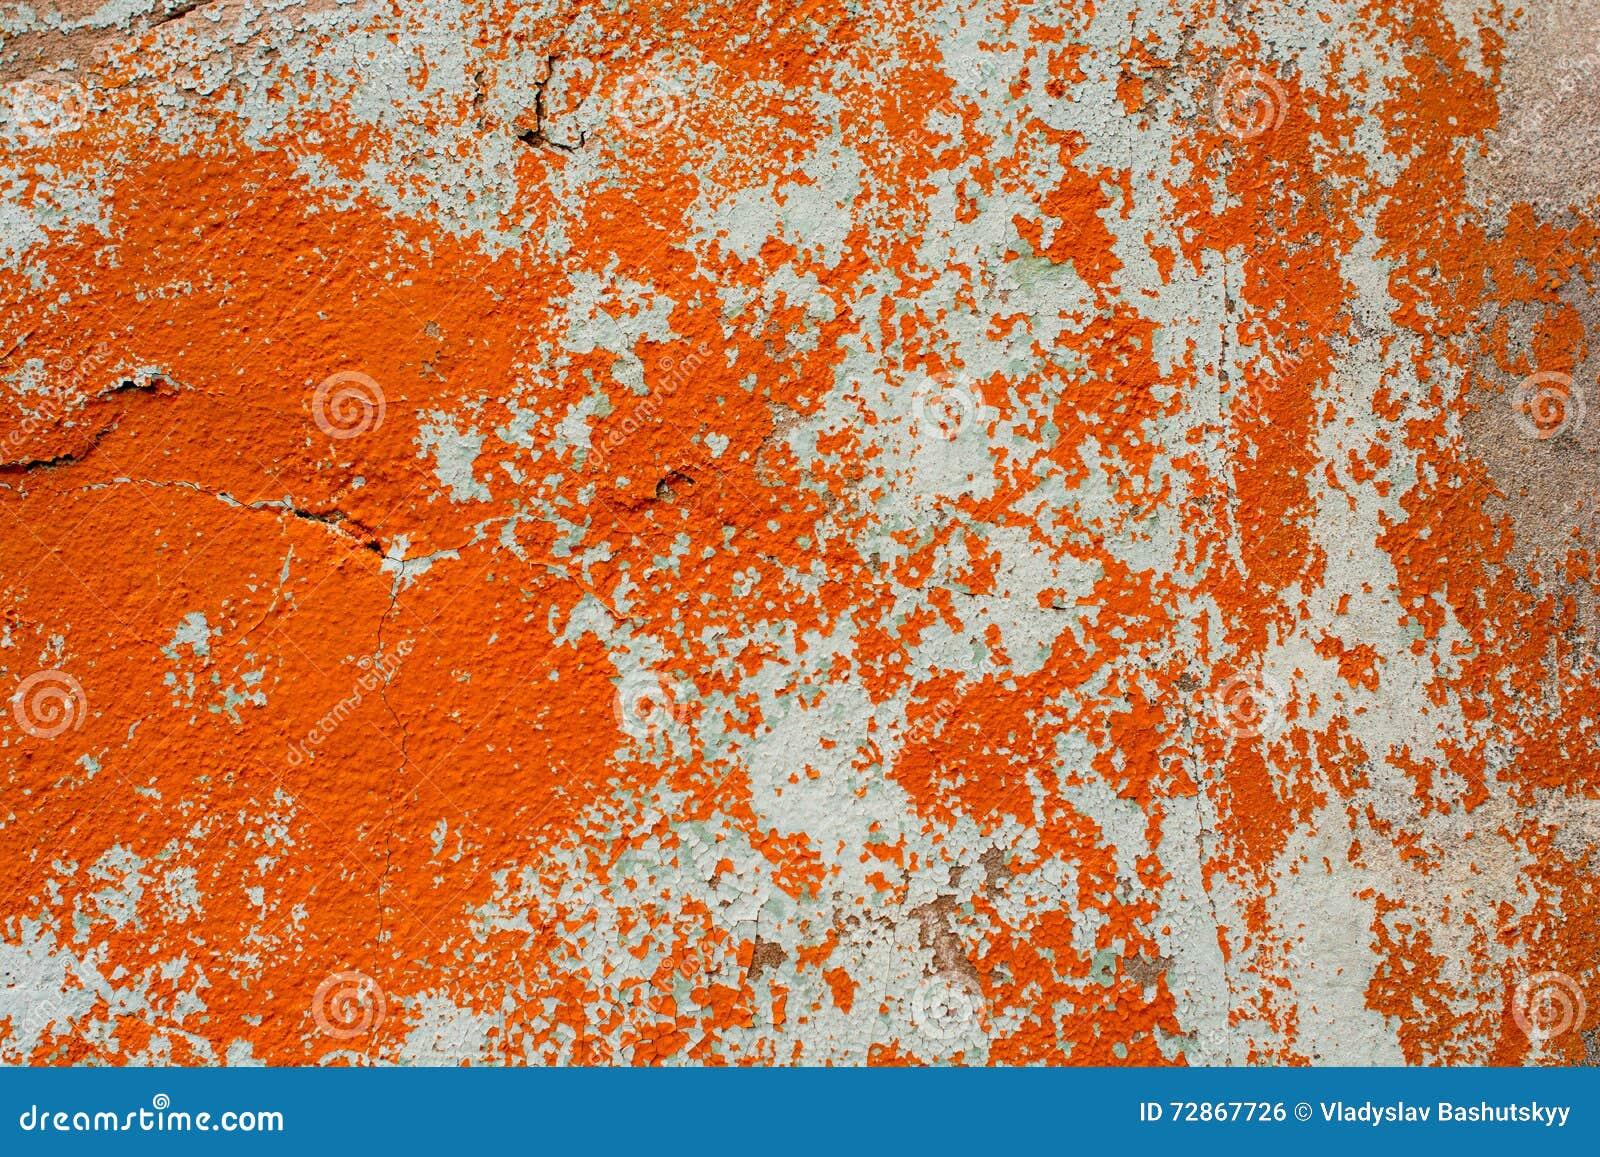 Rustic Orange Paint peeling paint wall seamless texture pattern rustic blue grunge